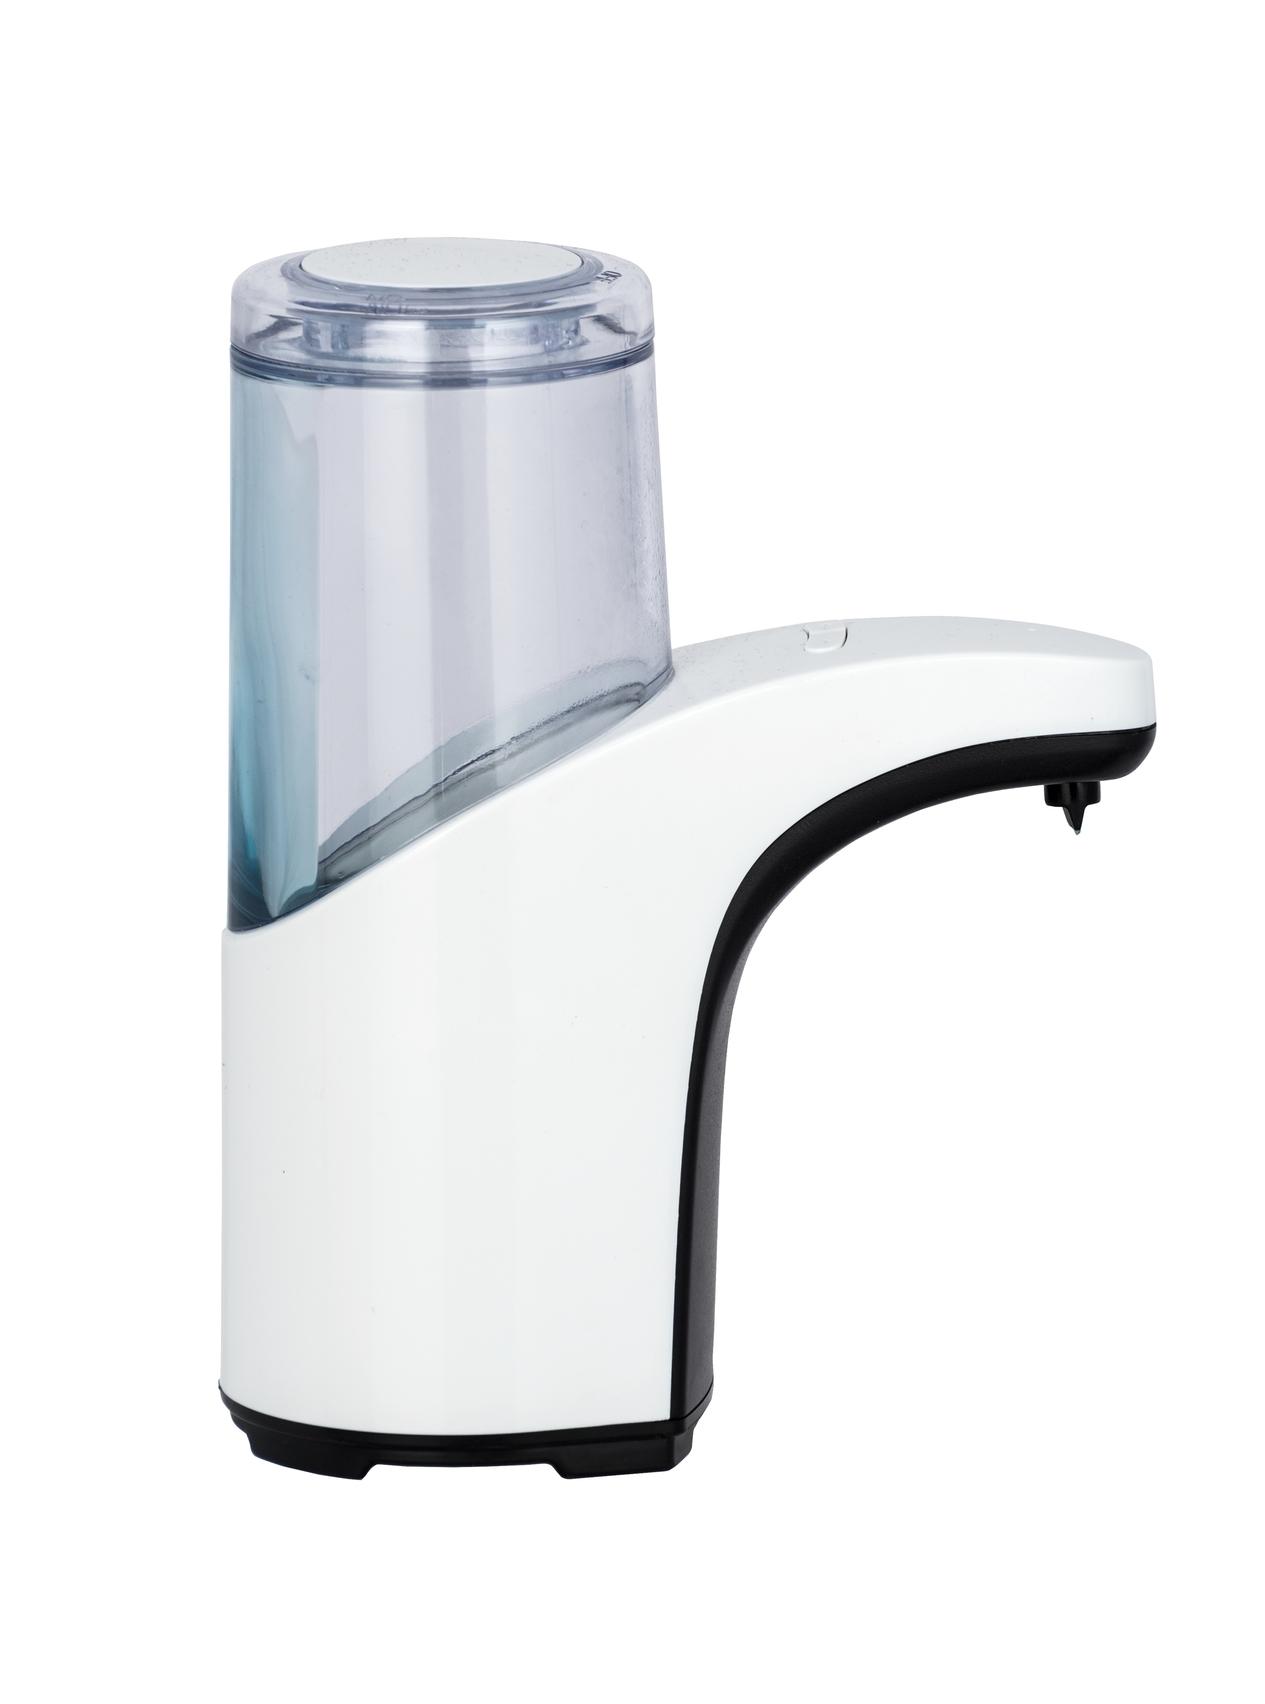 Dozator cu sensor pentru sapun, din acril si ABS, Butler Alb / Transparent, L15xl8xH19,5 cm imagine